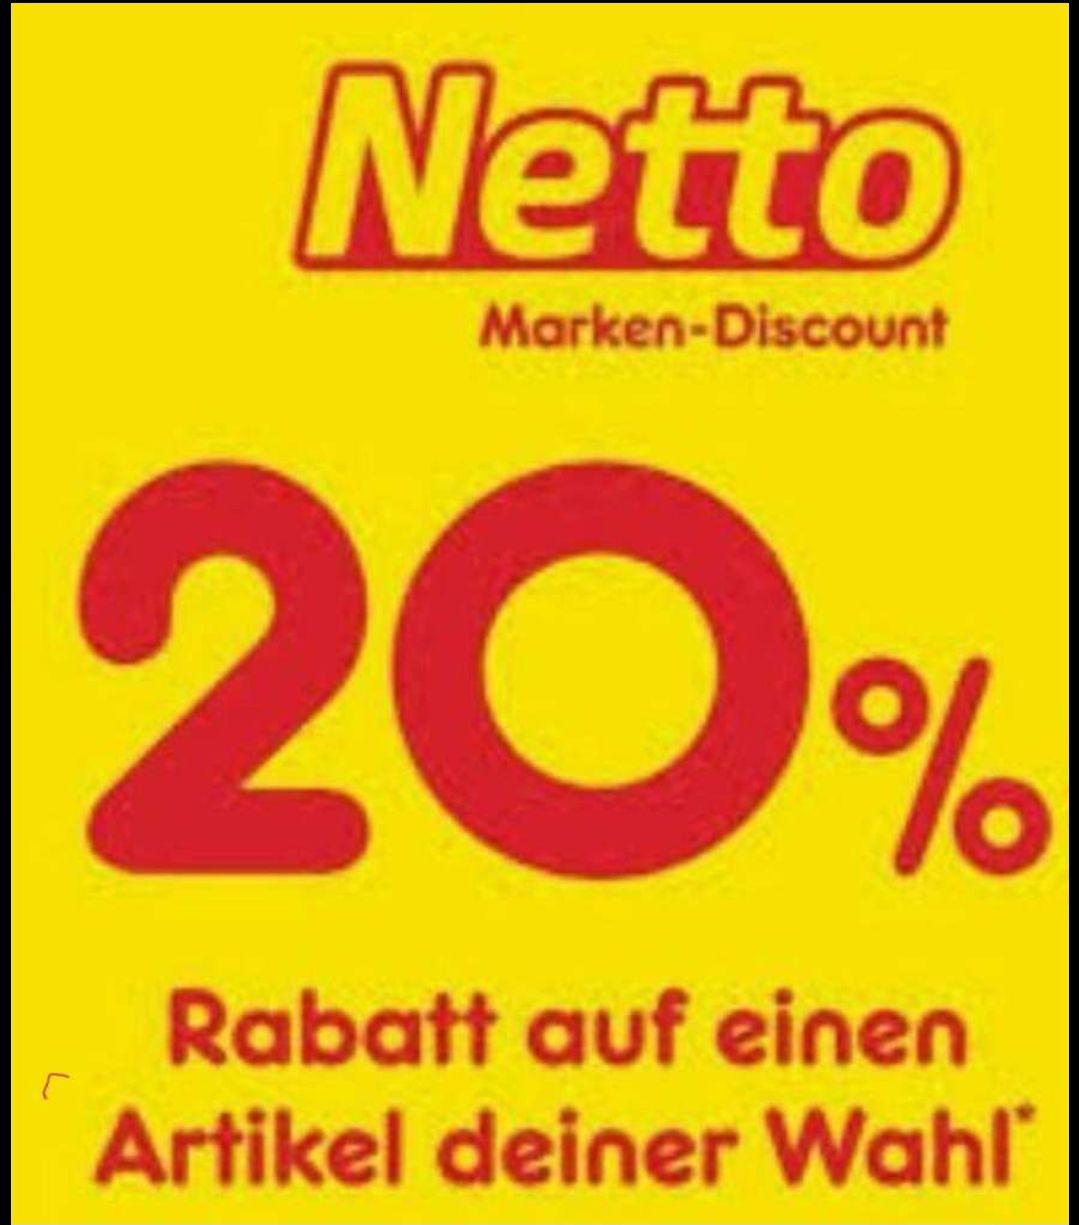 [Netto MD] Rabatt Coupons KW18 (03.05. - 08.05.), bundesweit einsetzbar